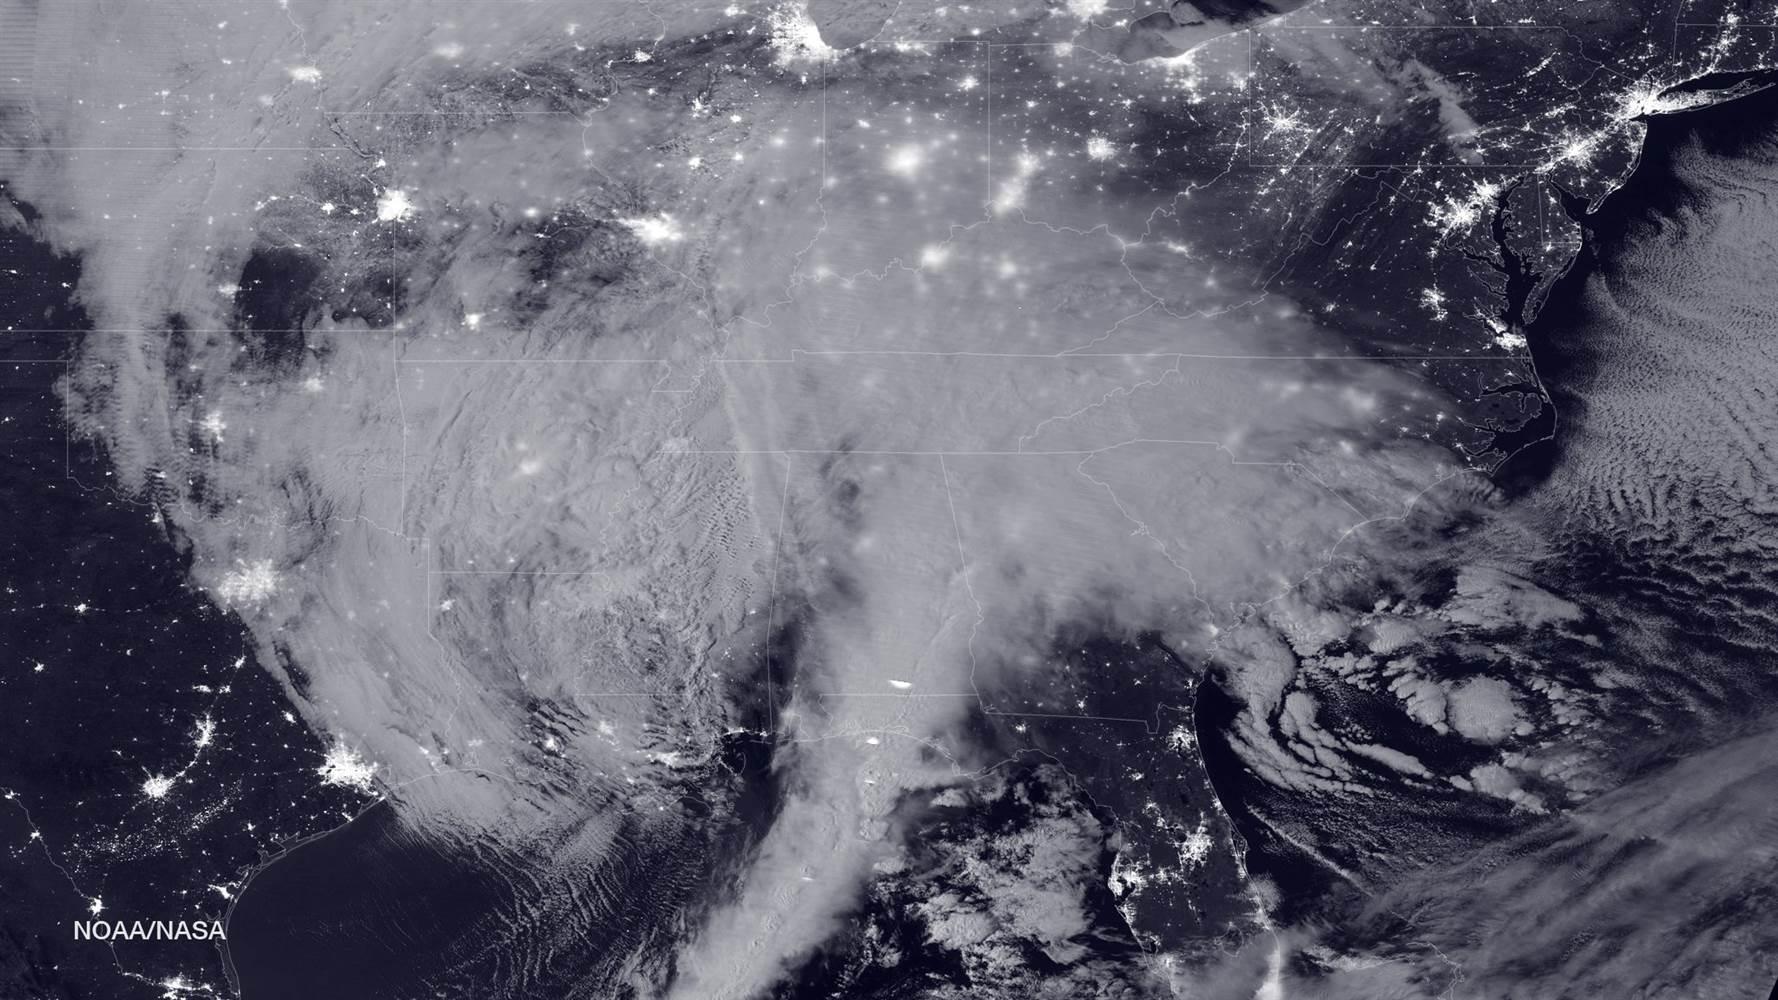 160122-blizzard-noaa-nasa-1129a_279ac09ea40c344dda5728f22b2b9a91.nbcnews-ux-2880-1000